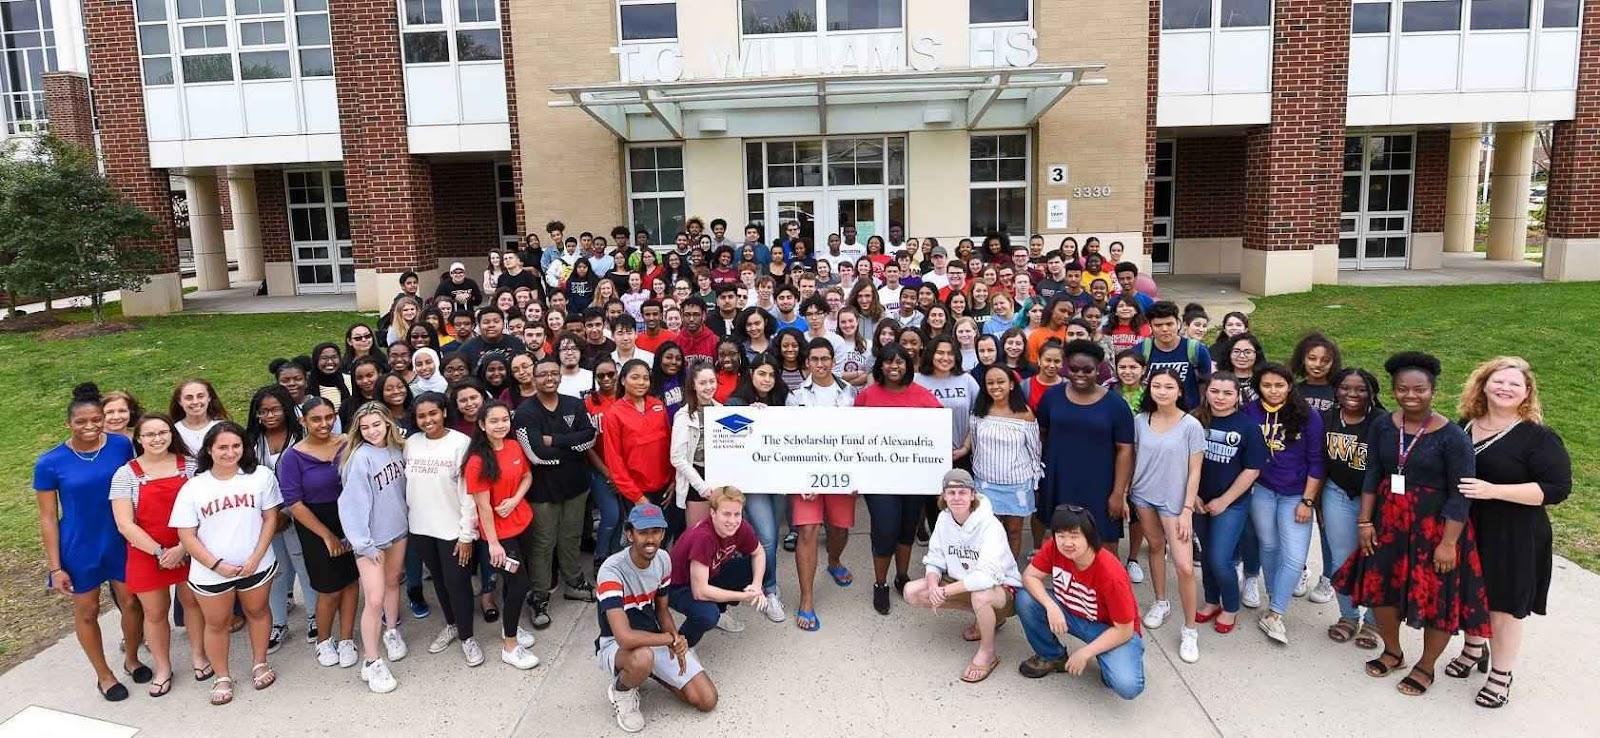 SCHOLARSHIP FUND OF ALEXANDRIA - Scholarship Fund of Alexandria COVID-19  Emergency Appeal